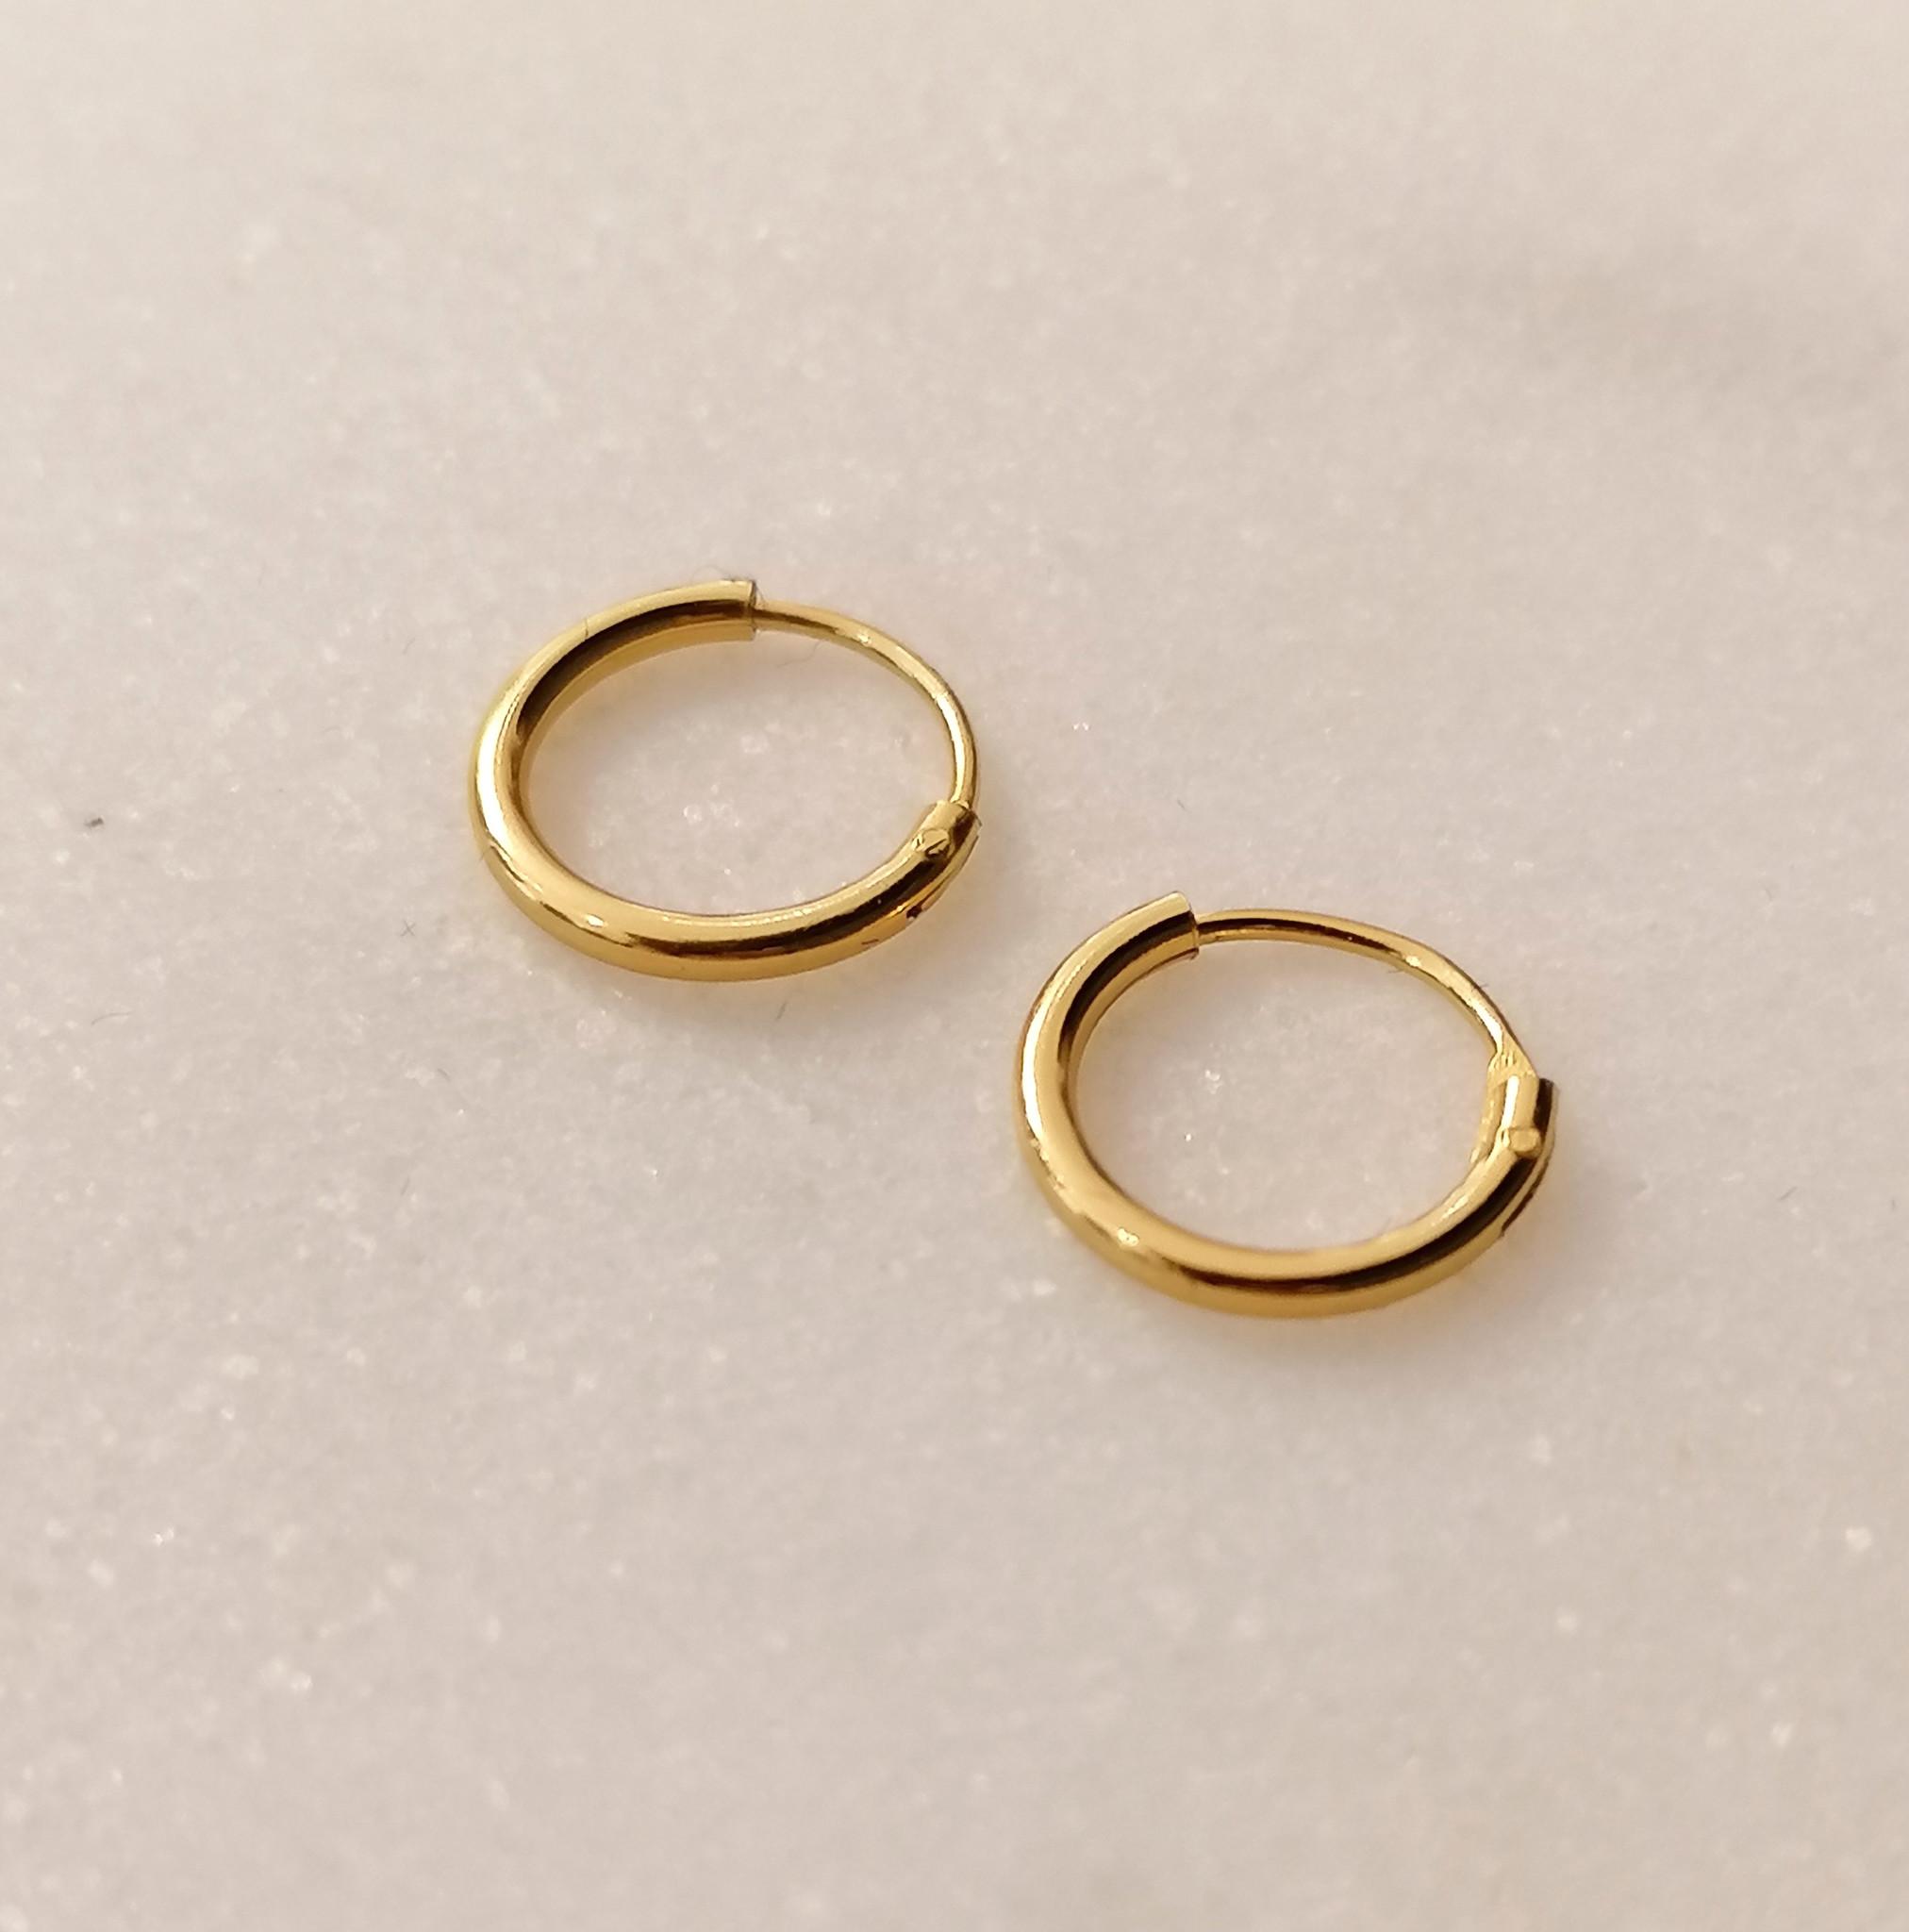 Small Hoop Earrings (12mm) - 925 Sterling Silver - Gold-6